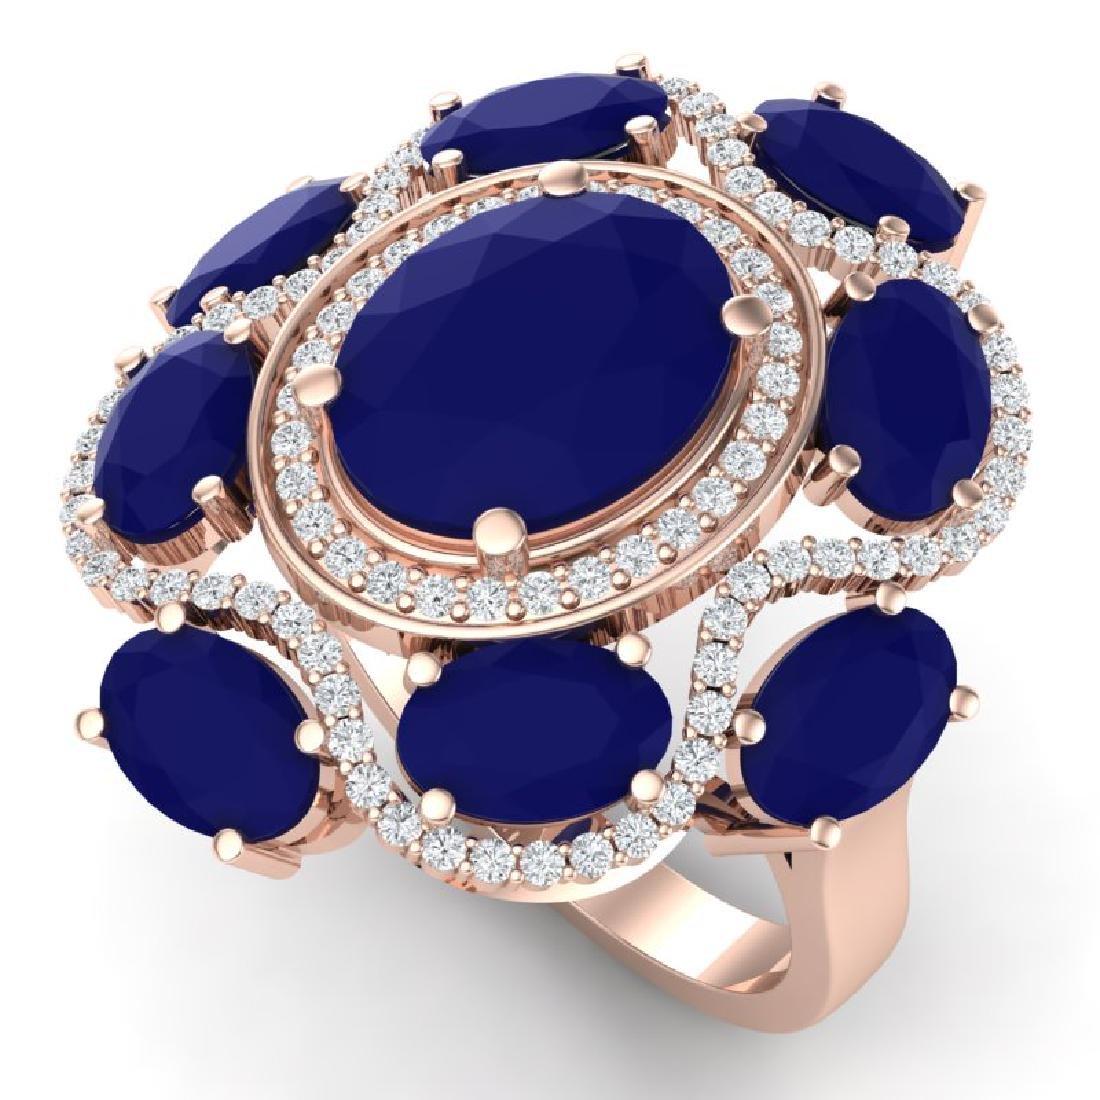 9.86 CTW Royalty Designer Sapphire & VS Diamond Ring